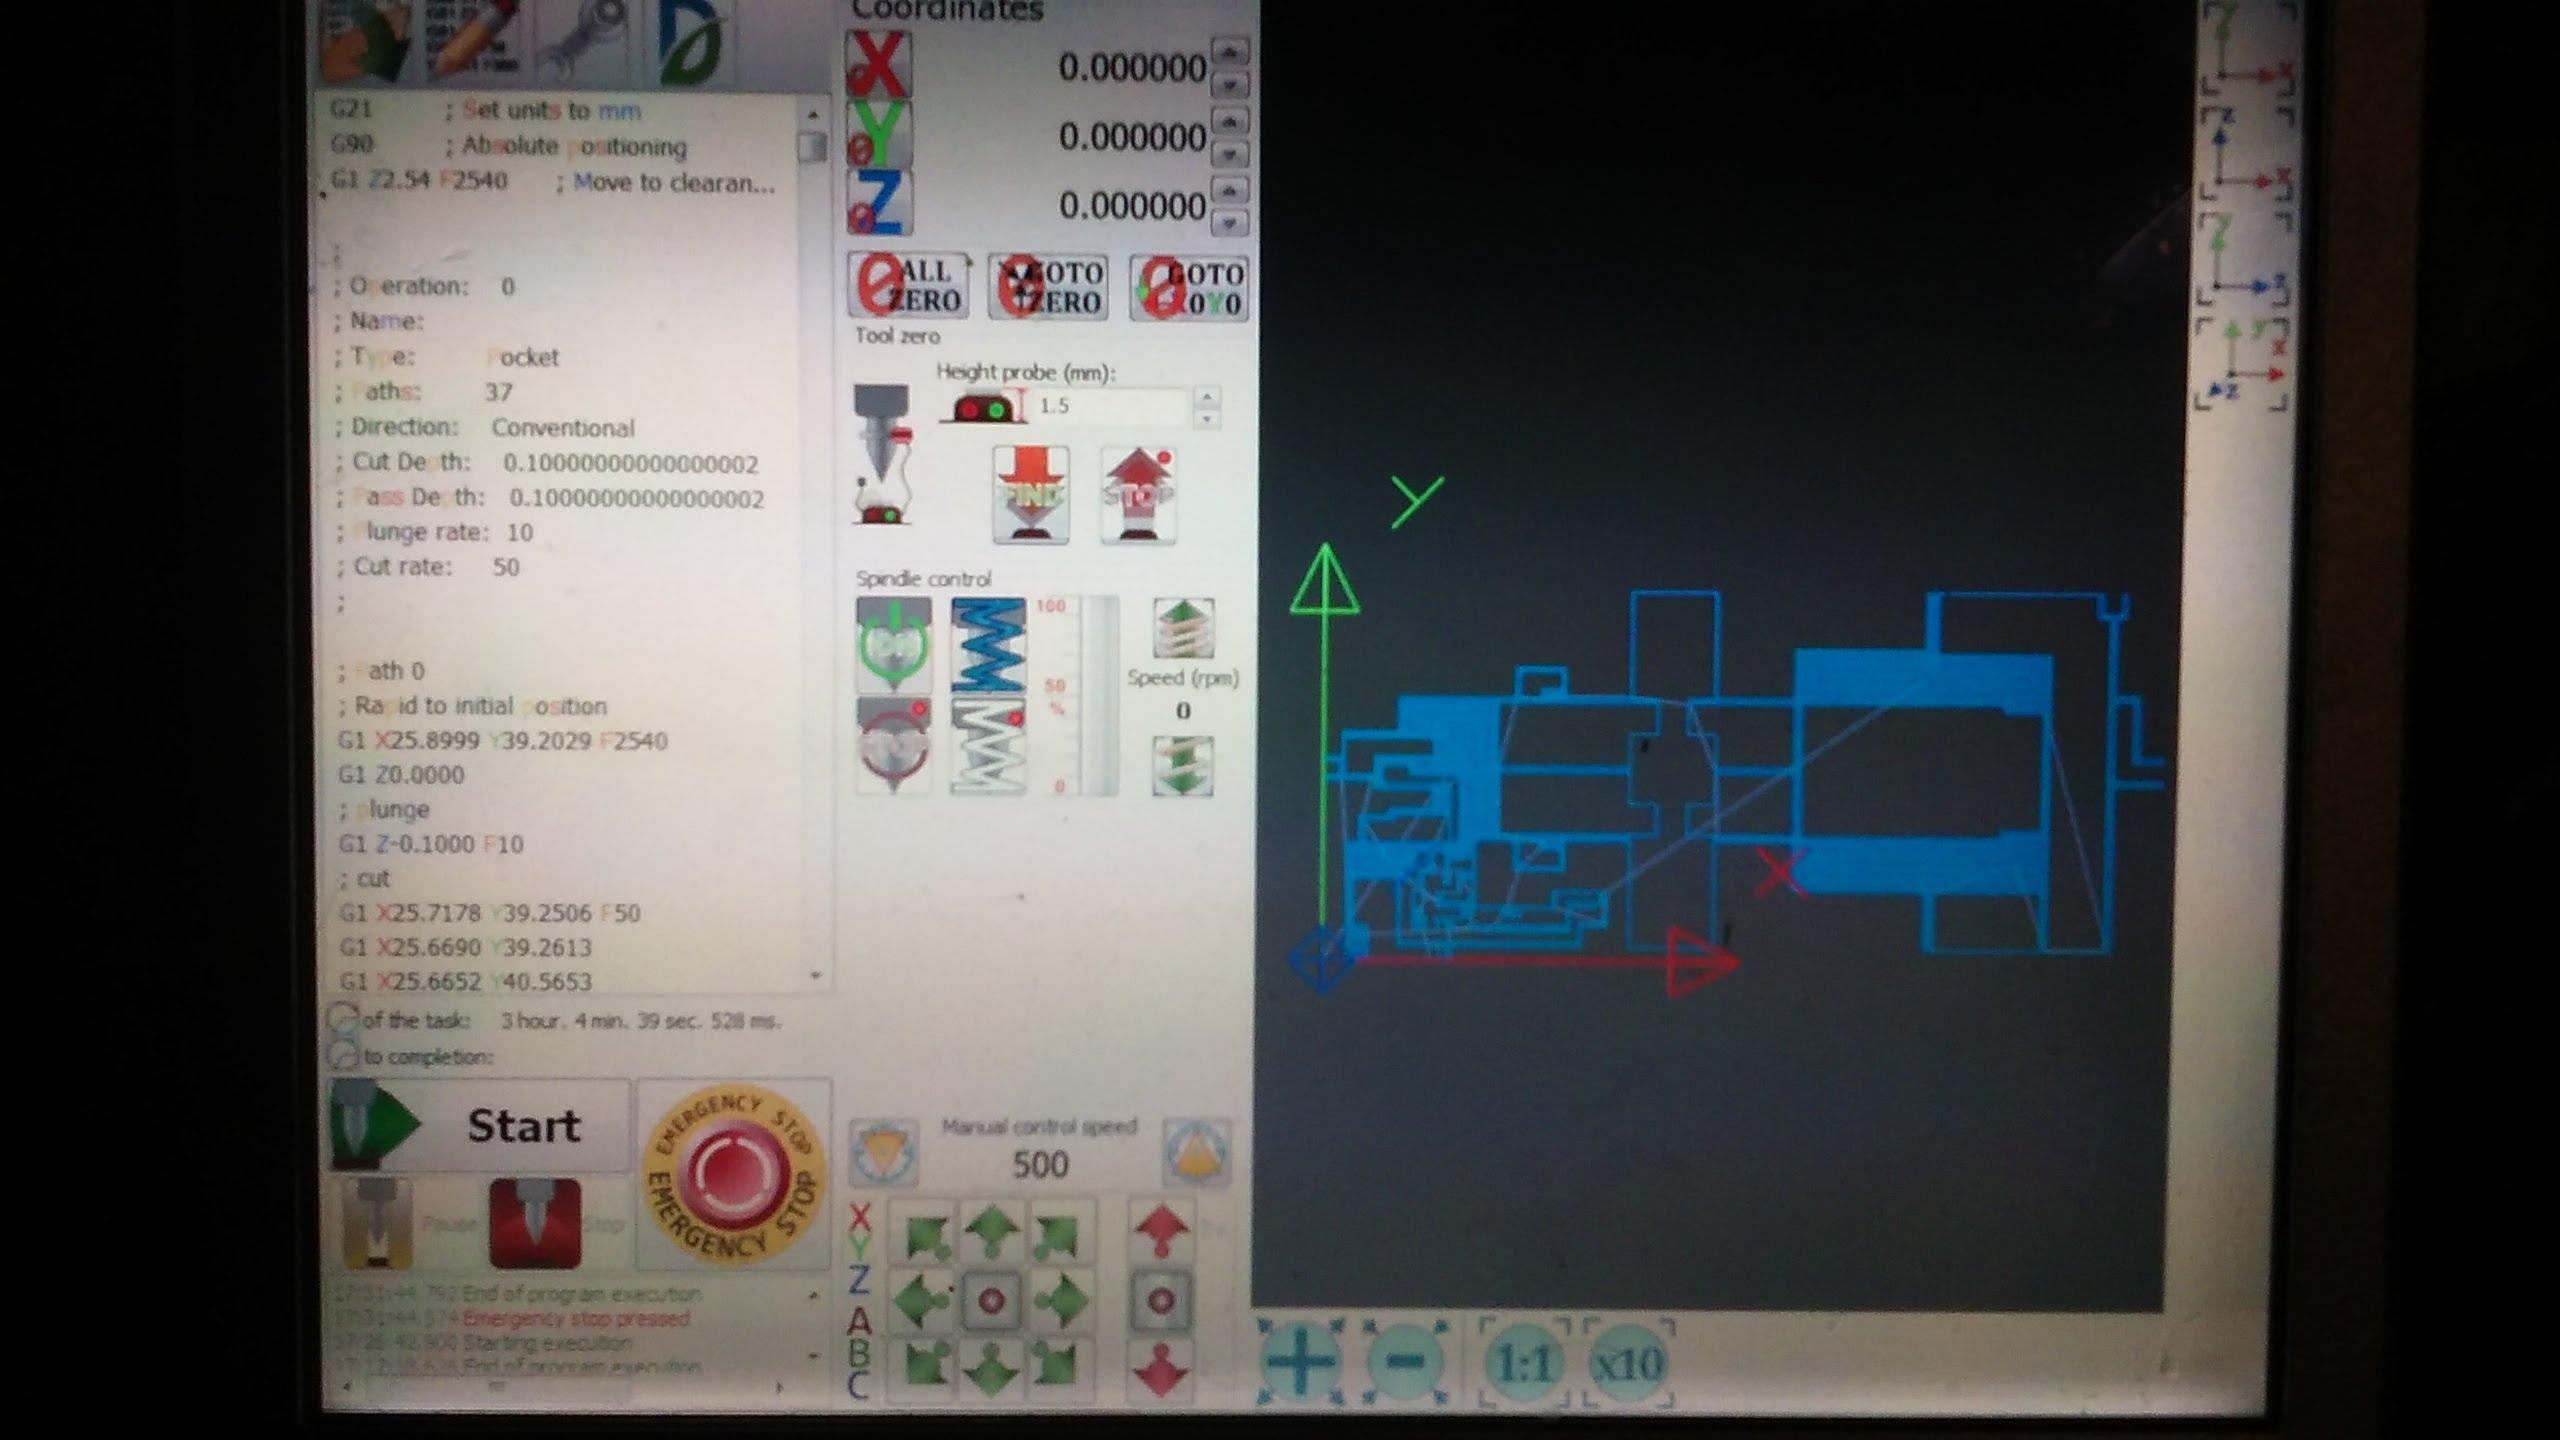 mrf300_screenshot_Drufel.jpg